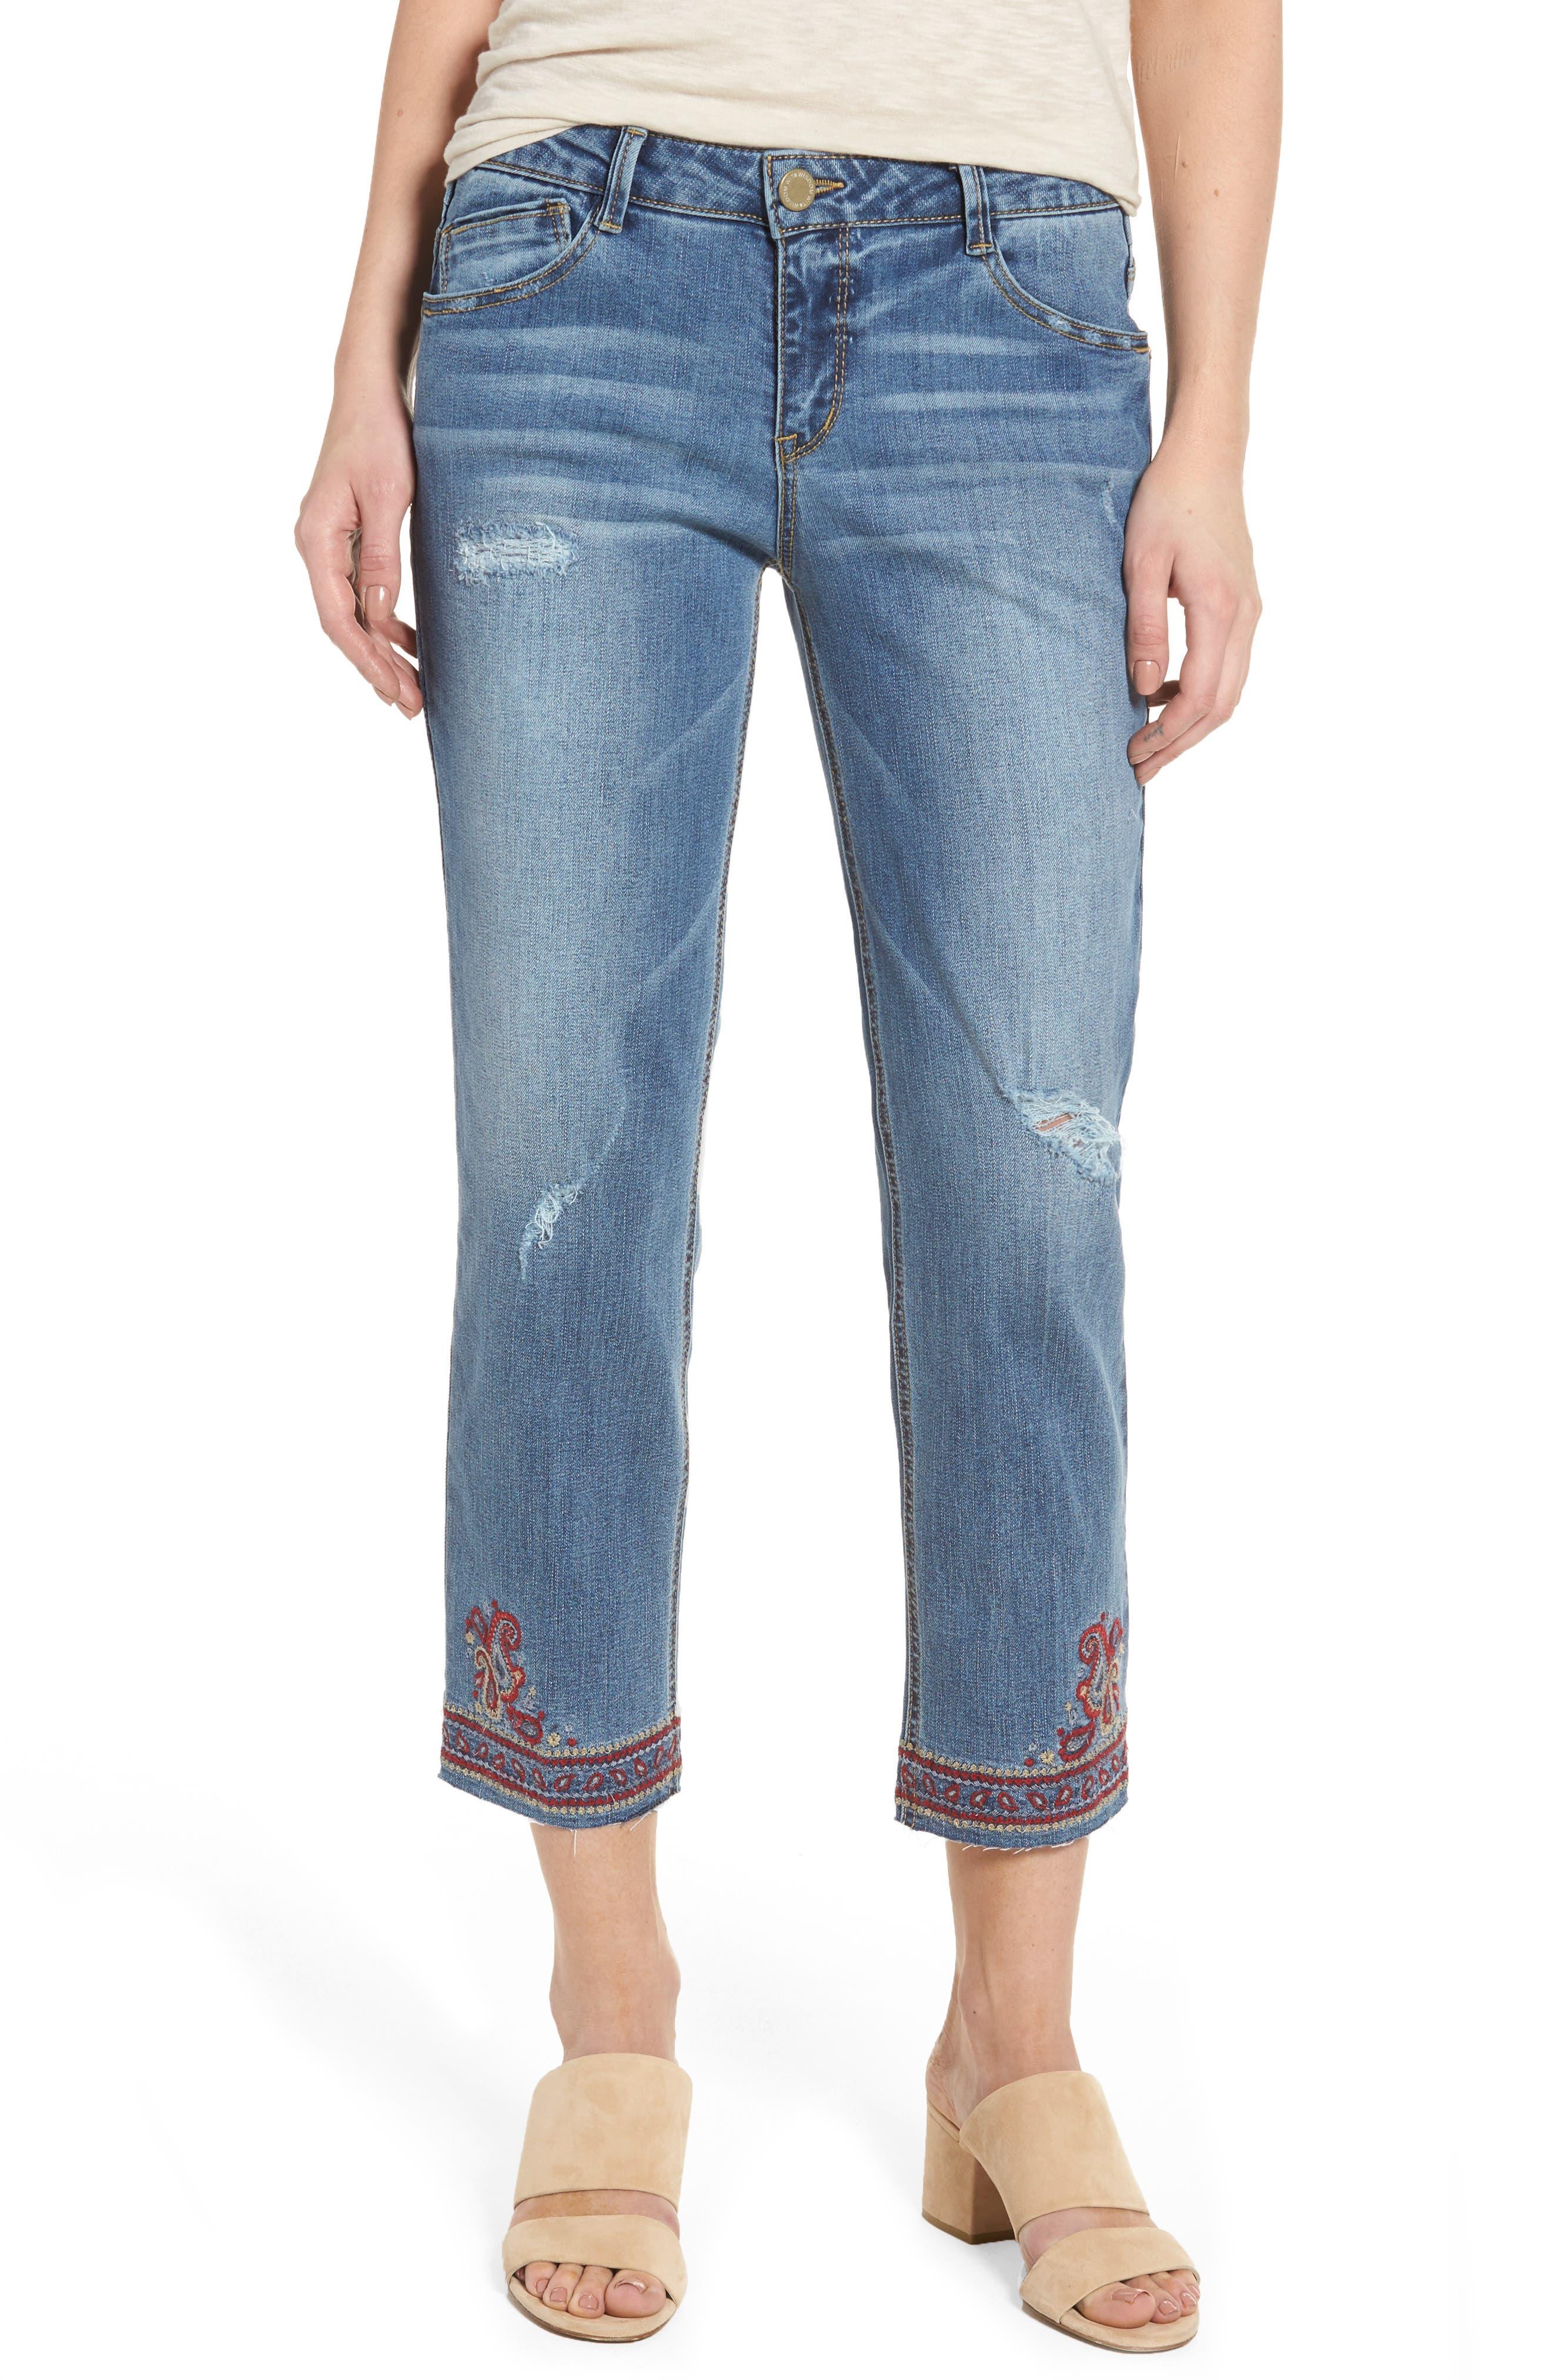 Wit & Wisdom Embroidered Slim Crop Jeans (Nordstrom Exclusive)